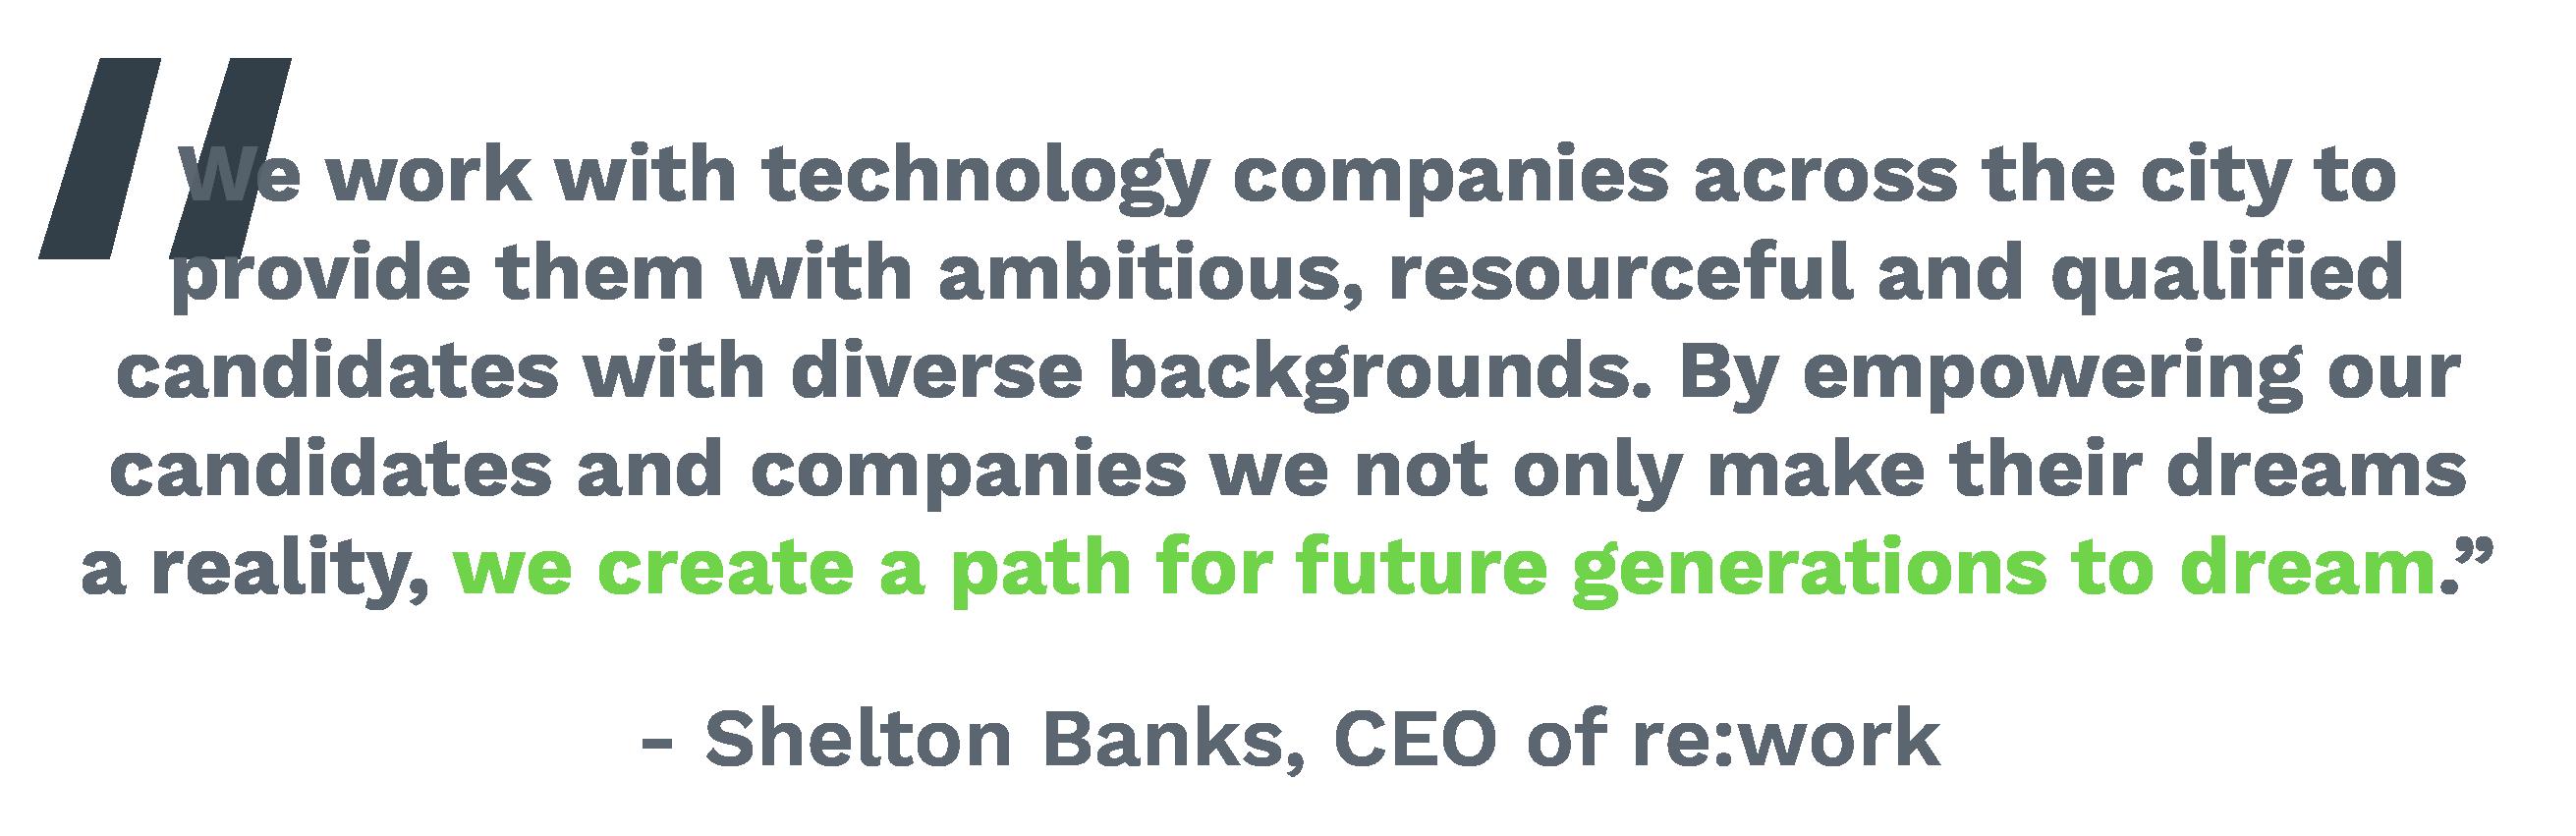 diversity+tech+organizations_1